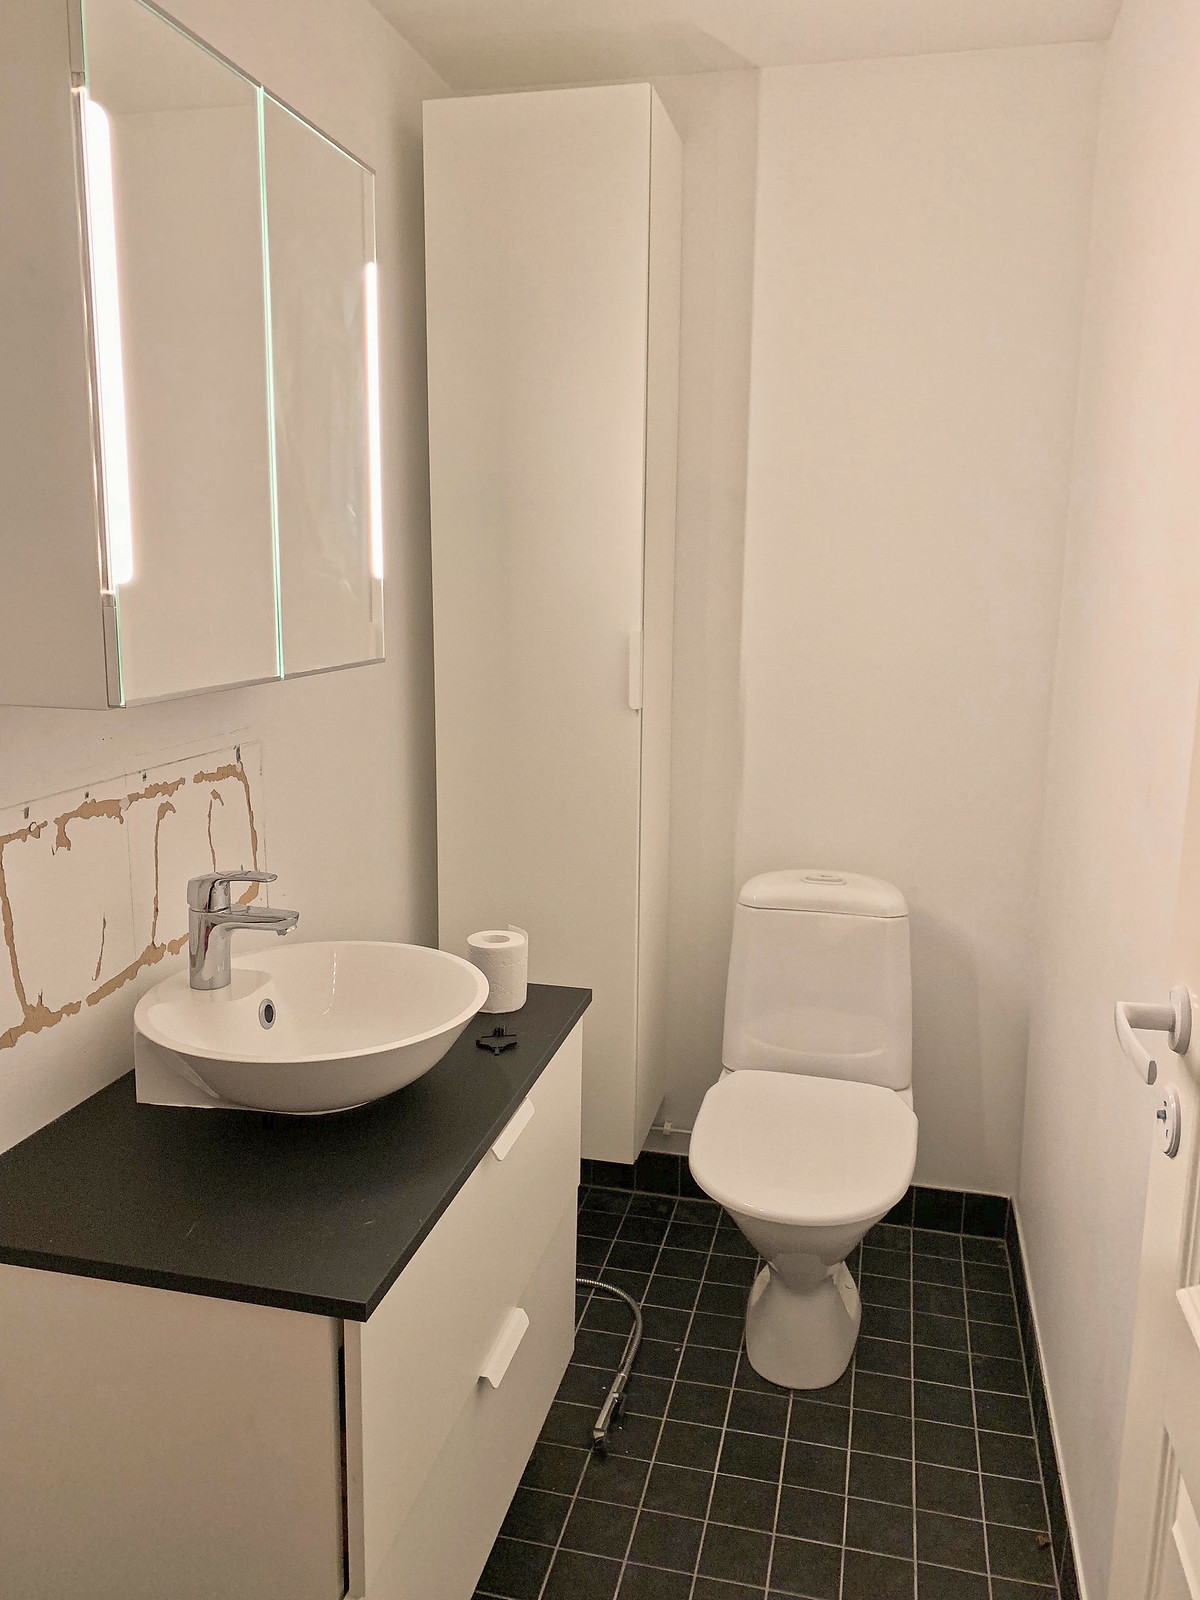 oma asunto pikku wc